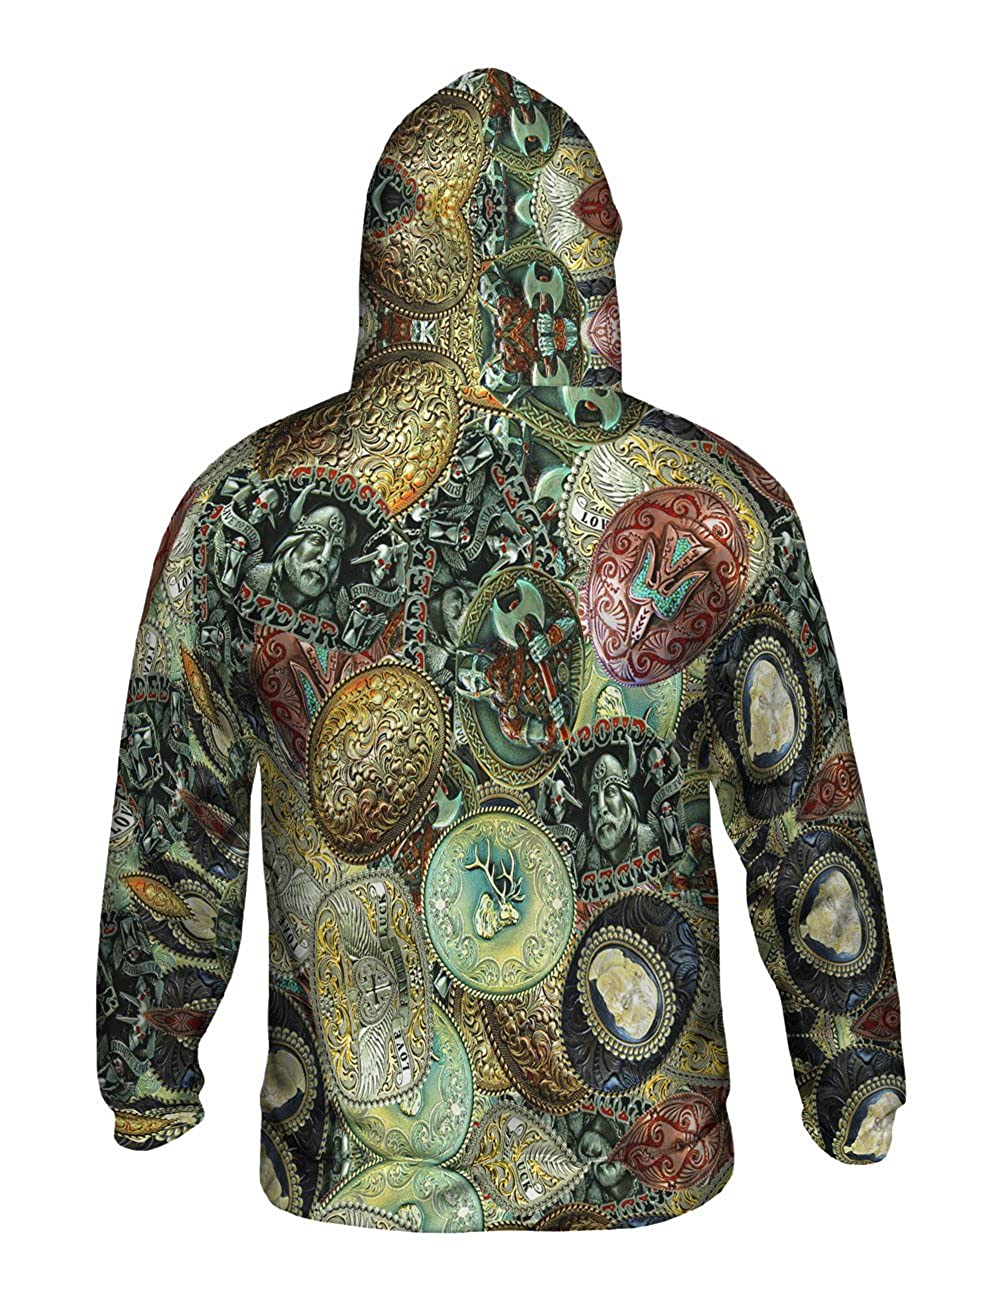 Allover Print Yizzam Cowboy Belt Buckle Pride Mens Hoodie Sweater